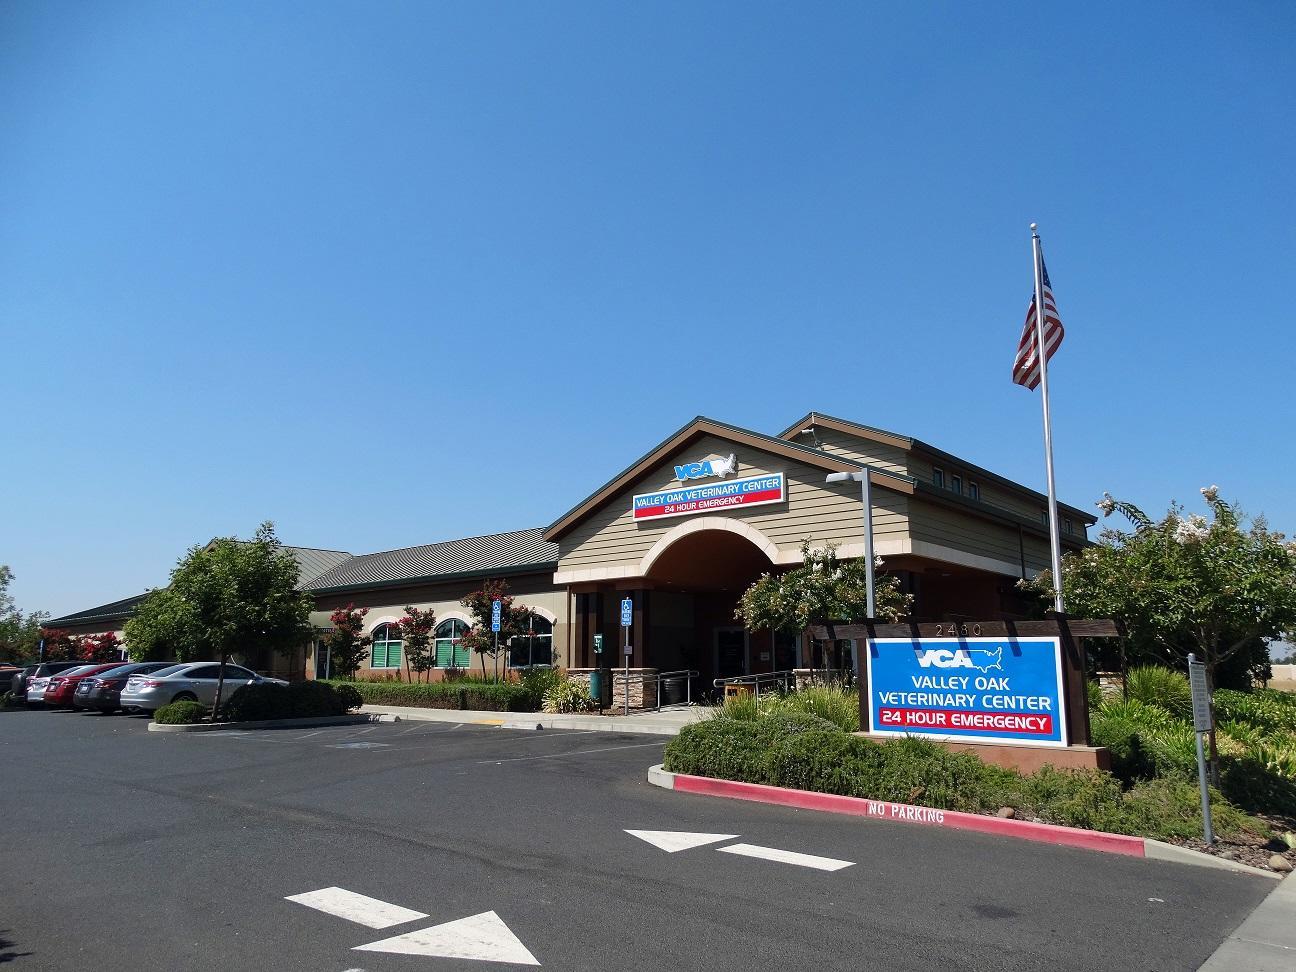 VCA Valley Oak Veterinary Center image 1